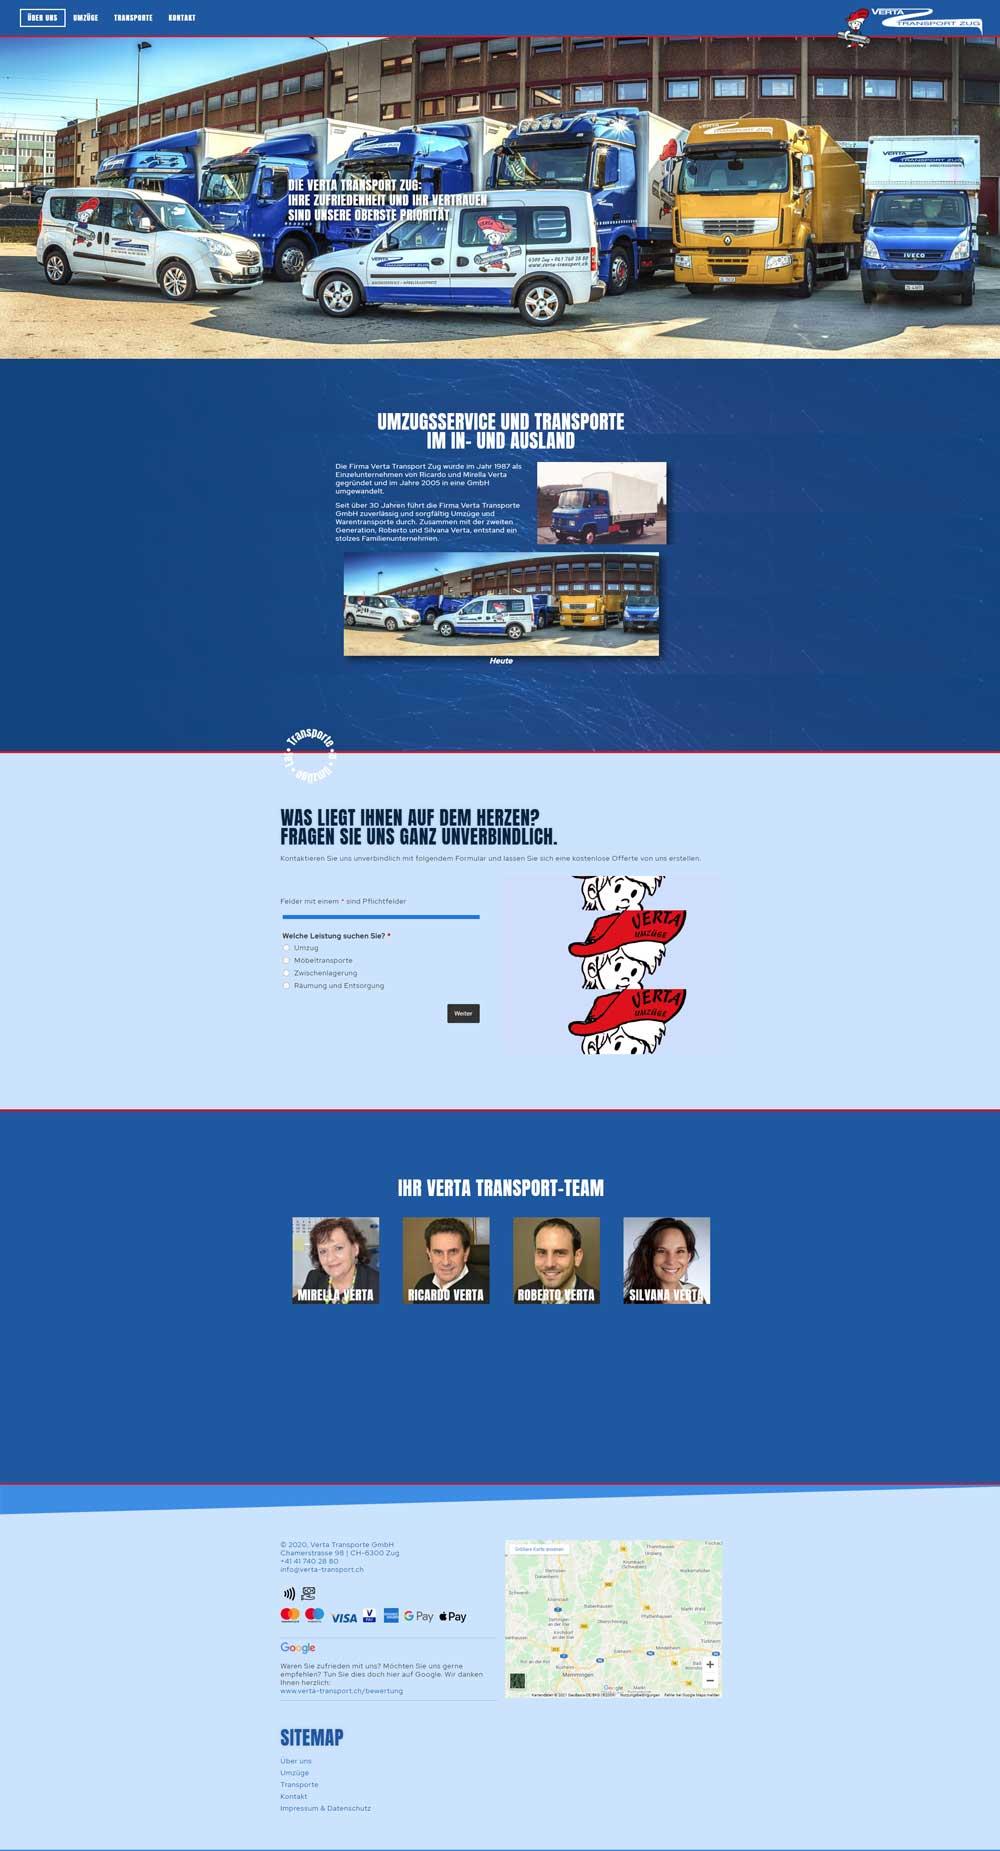 Verta Transport Zug - Screenshot der ganzen neuen Webseite